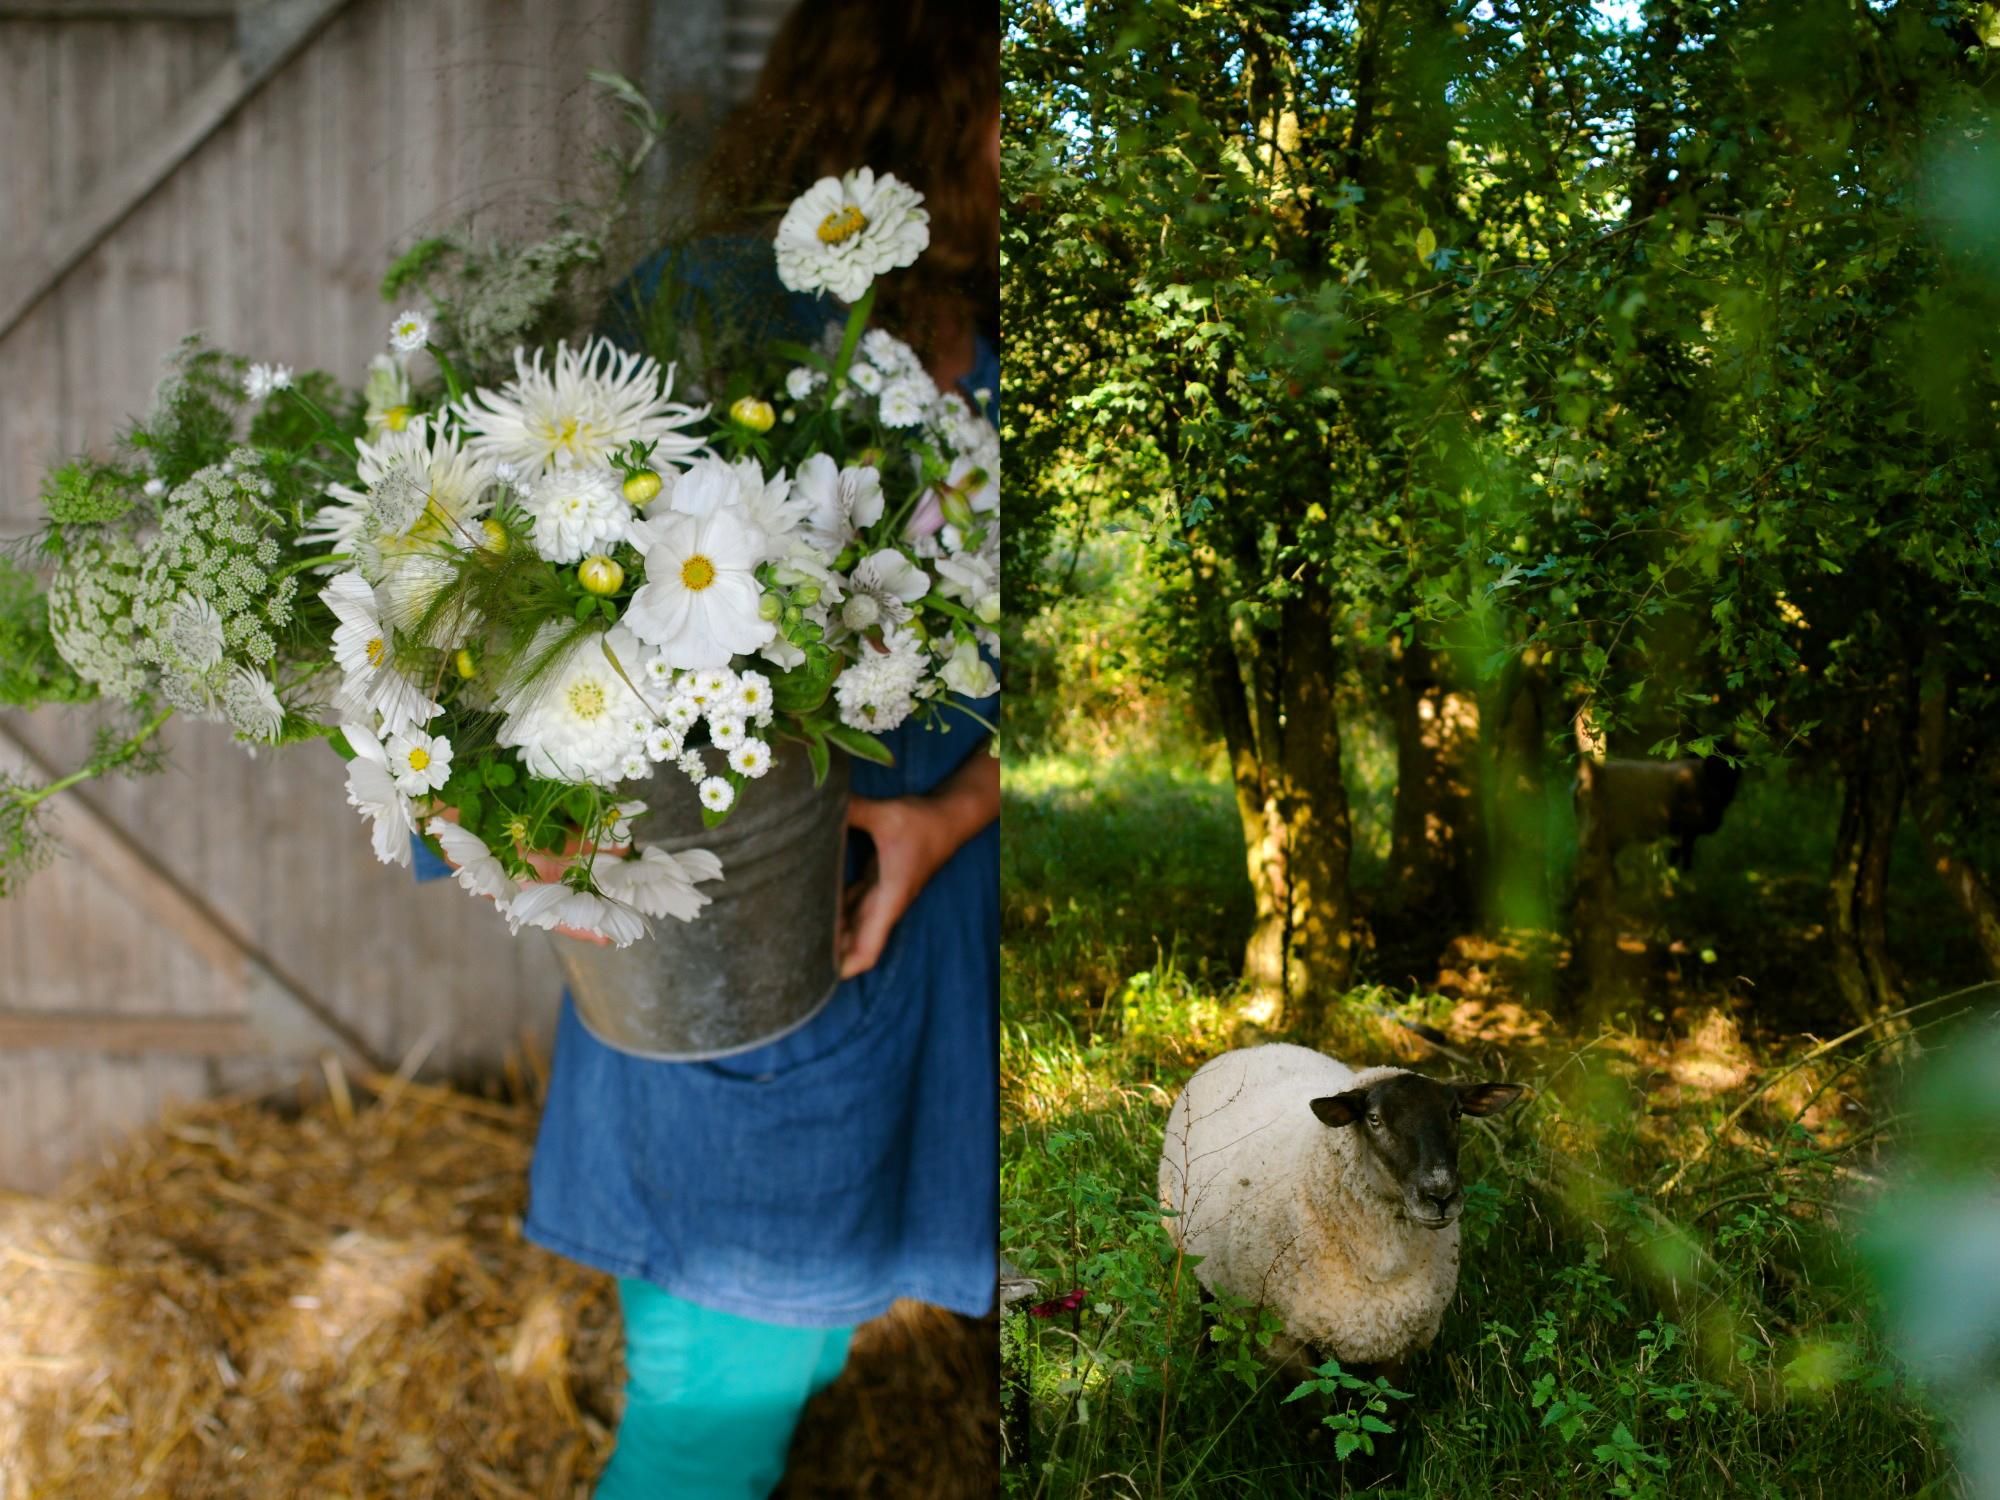 england sheep and lara flowers